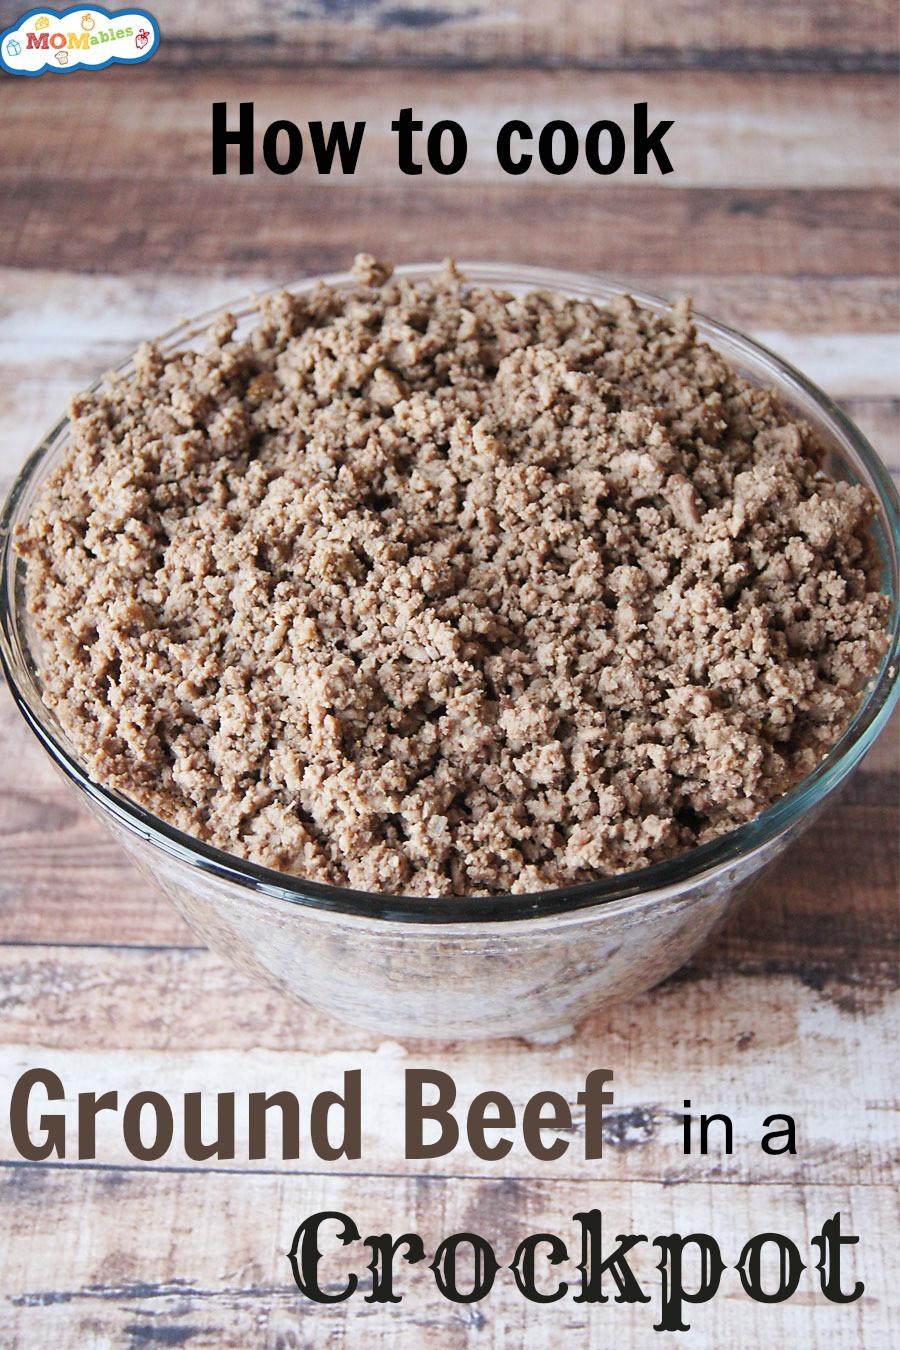 How To Cook Ground Beef  How to Cook Ground Beef in a Crockpot